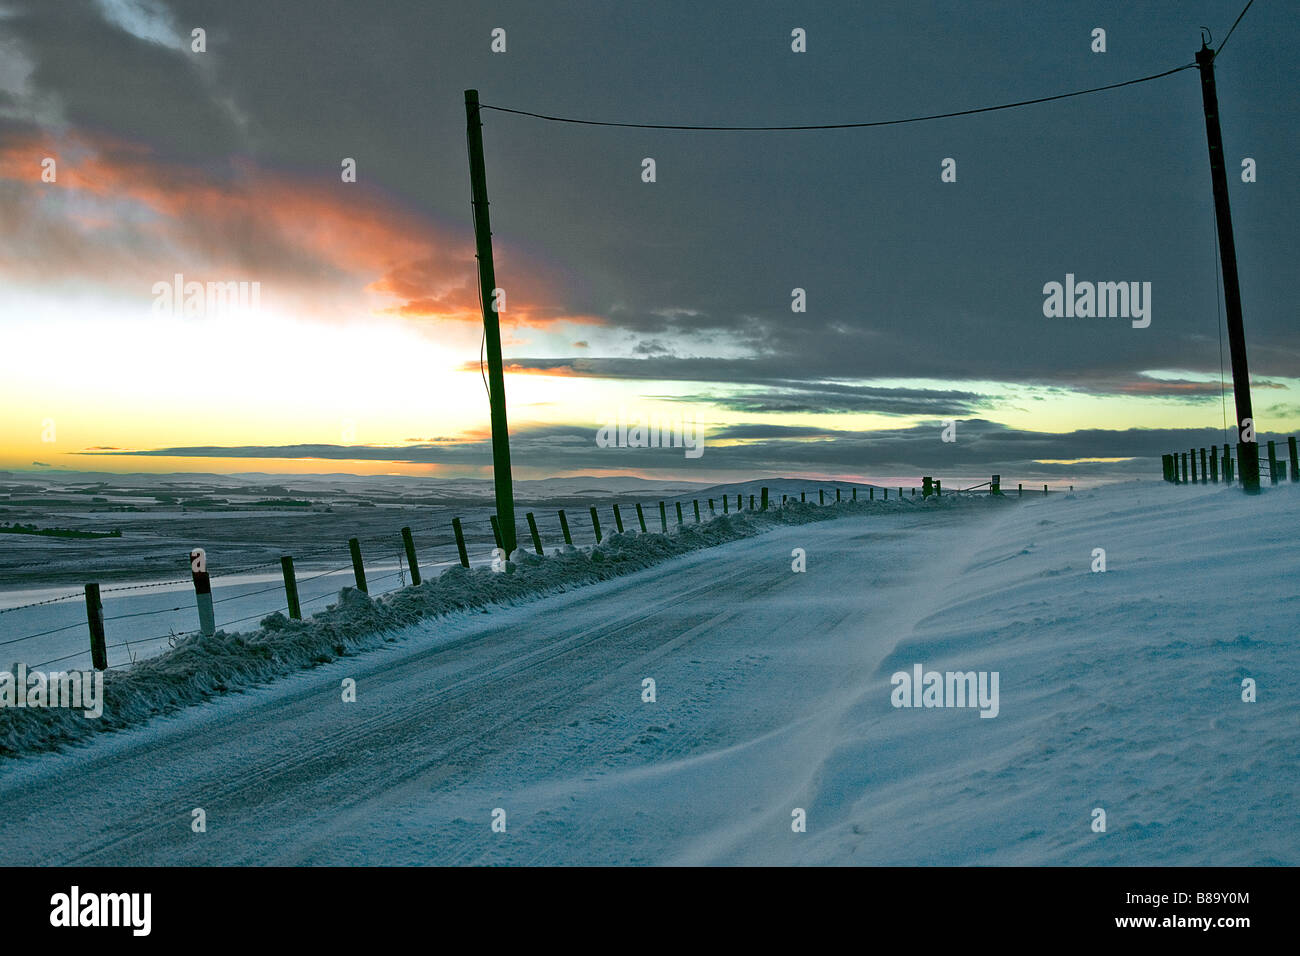 Snowdrift Lonformacus road Duns. Scottish Borders. - Stock Image